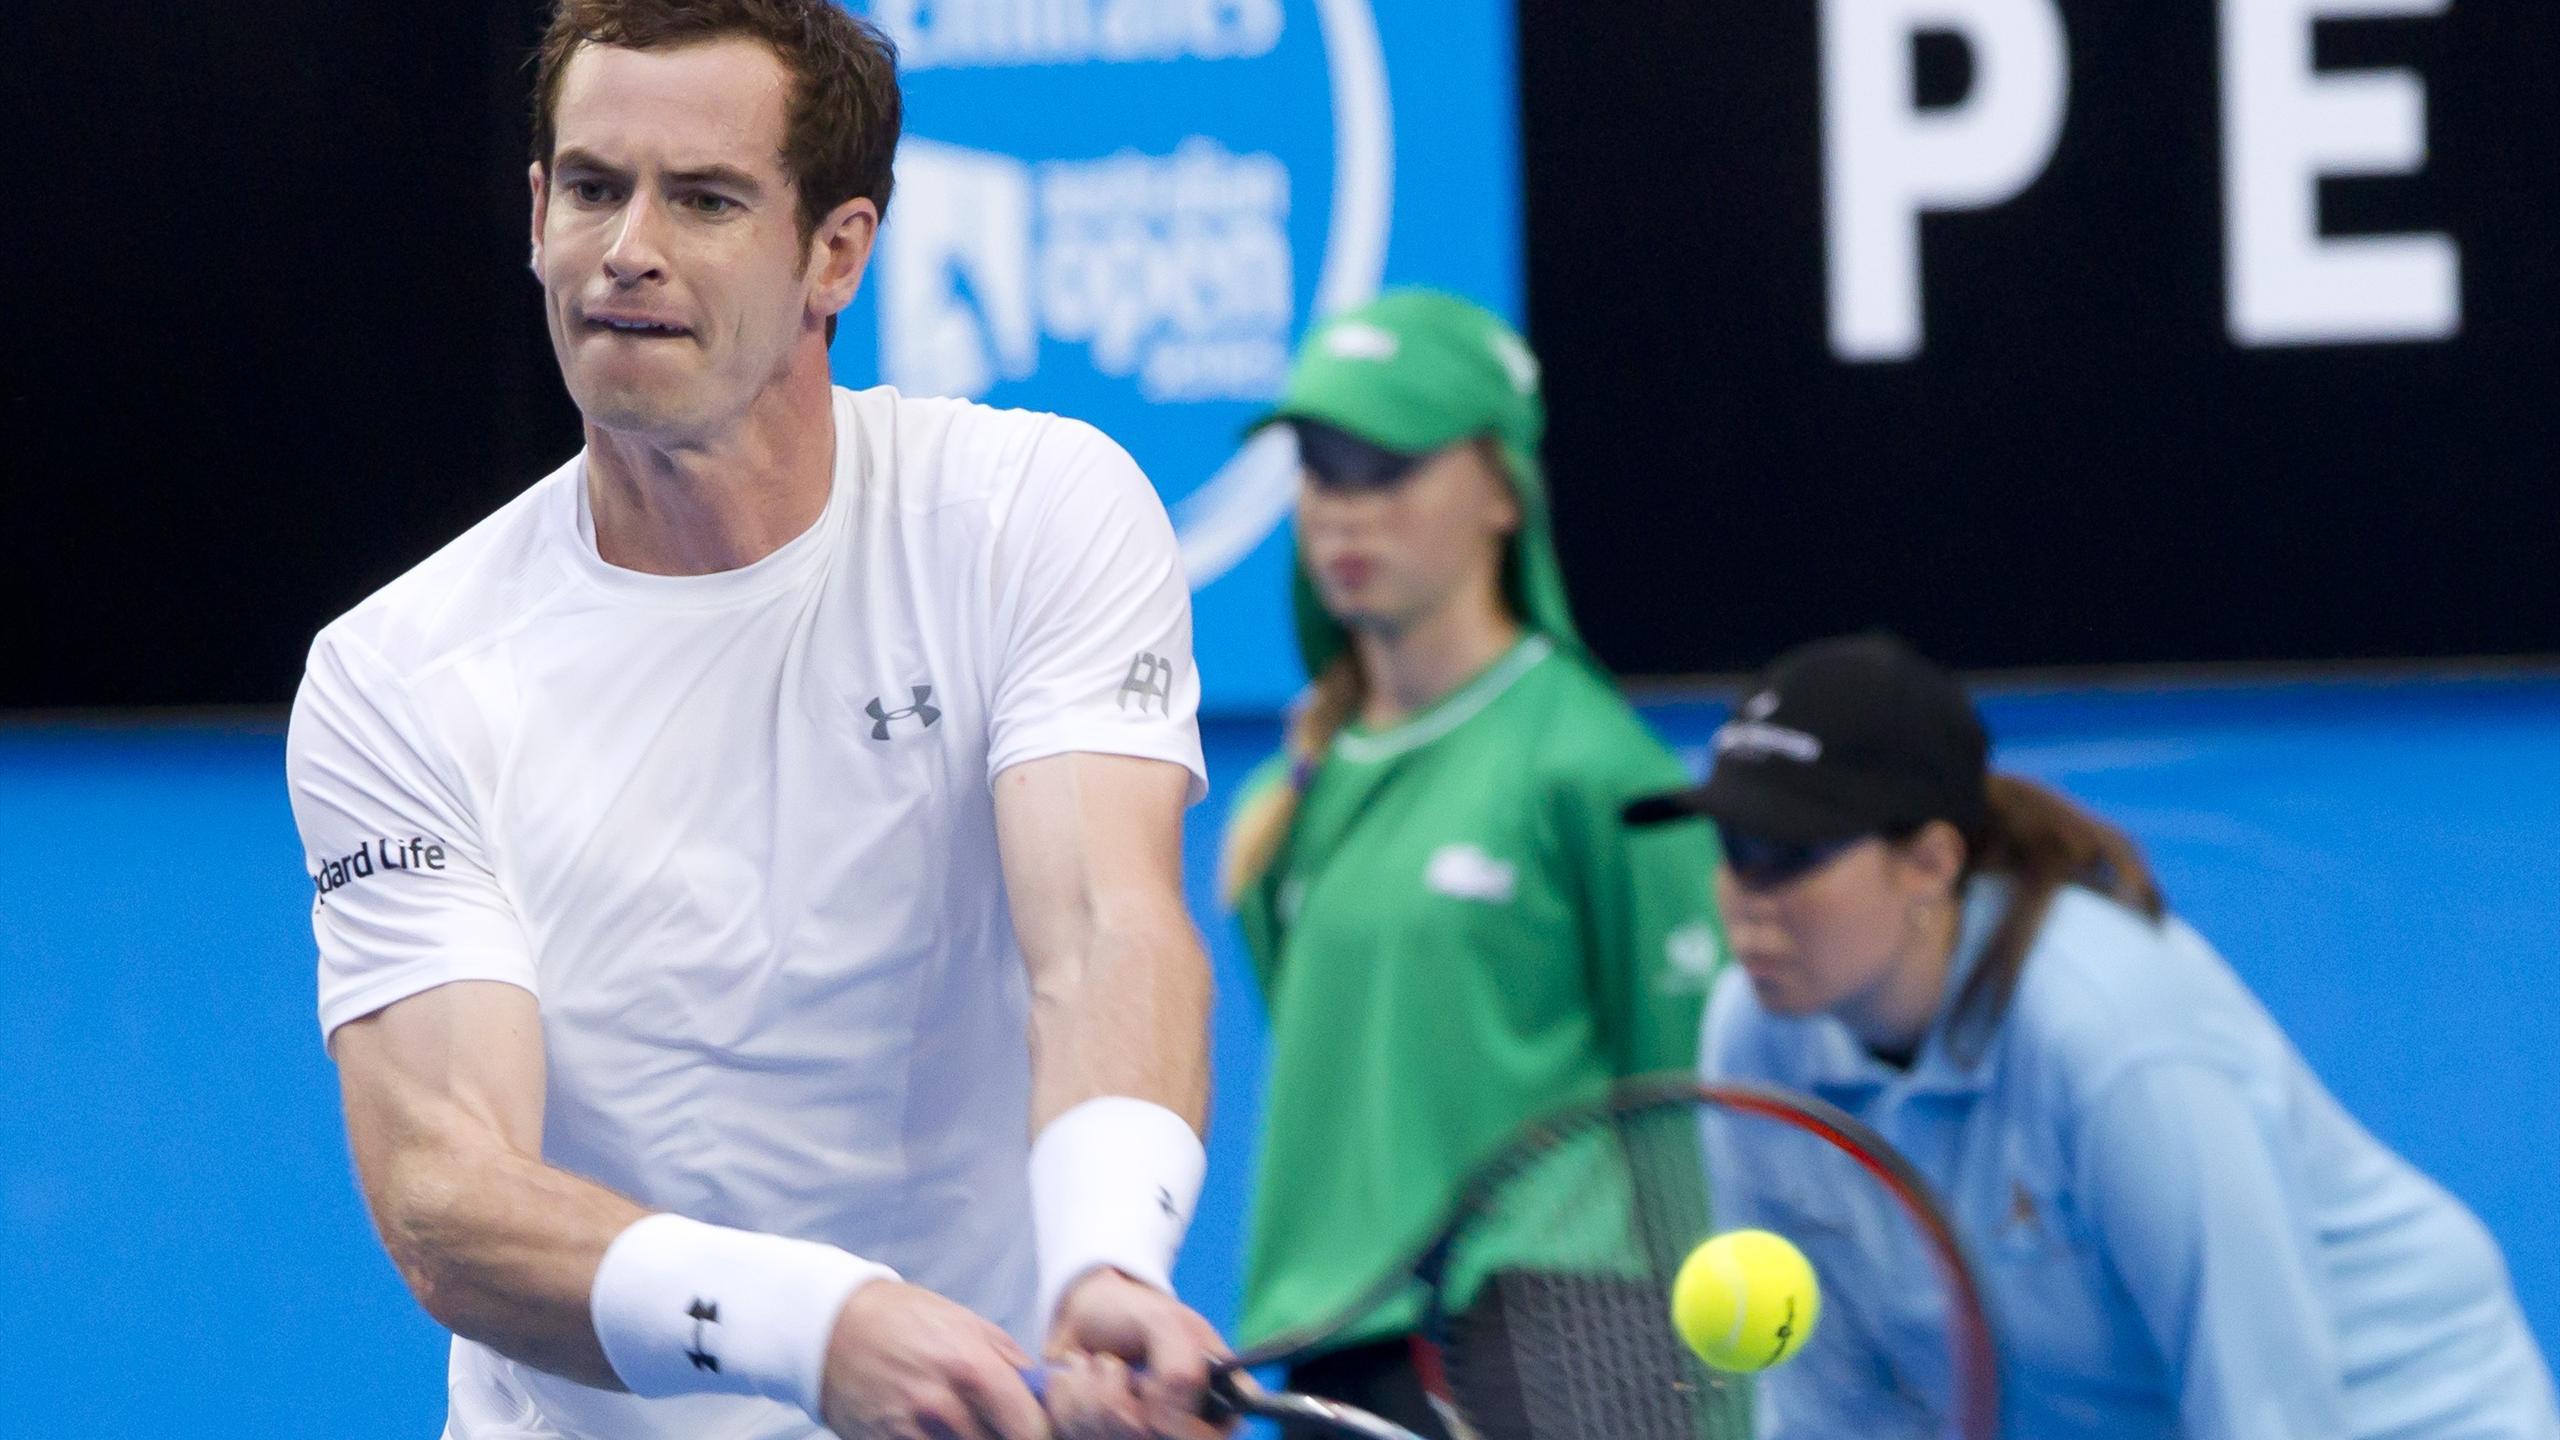 Andy Murray hits a return against Kenny de Schepper